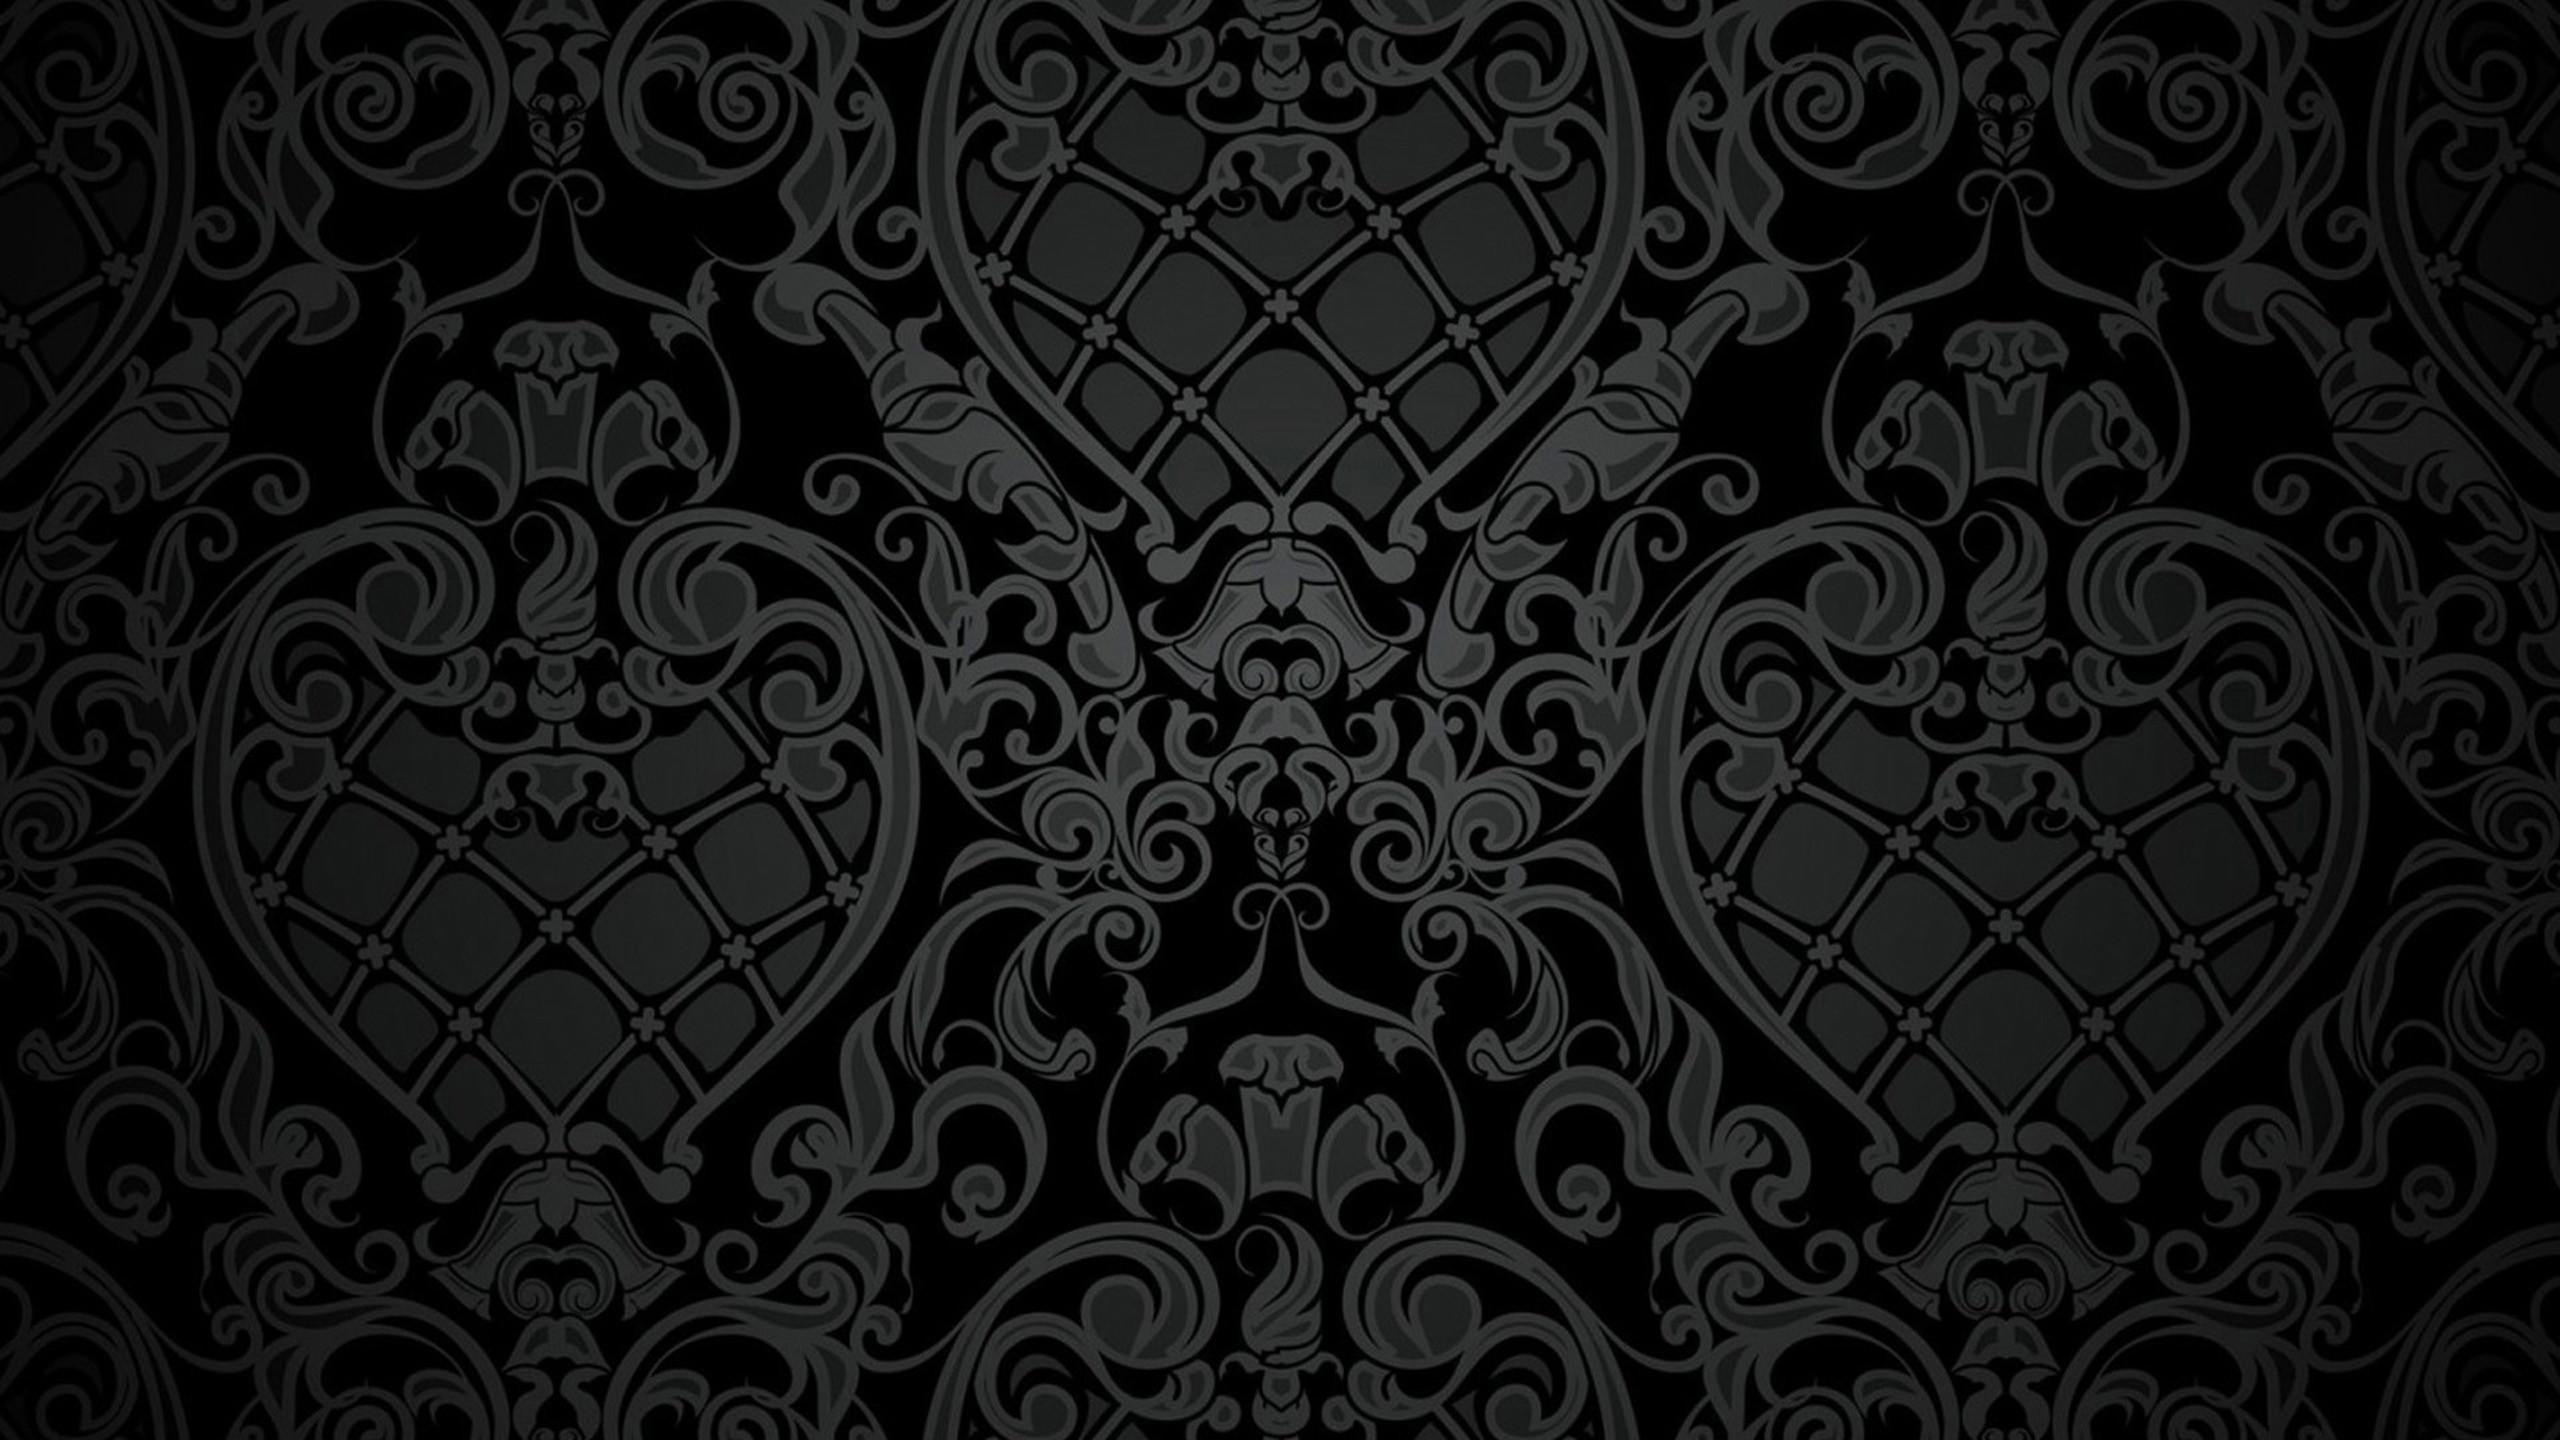 Black Designs Wallpaper